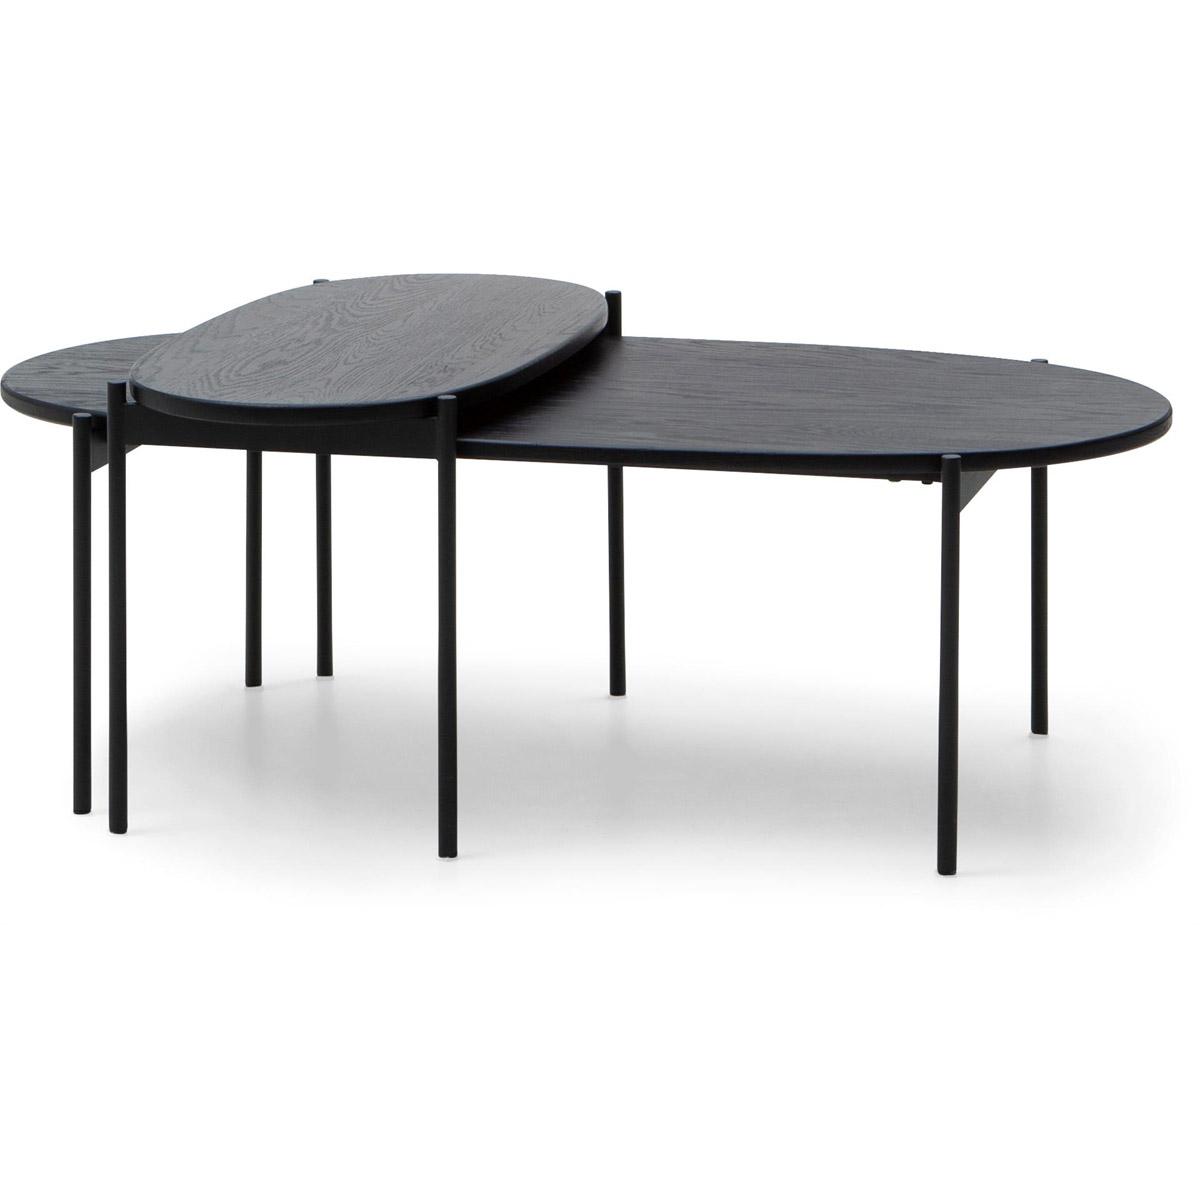 Skye ovala soffbord svart set